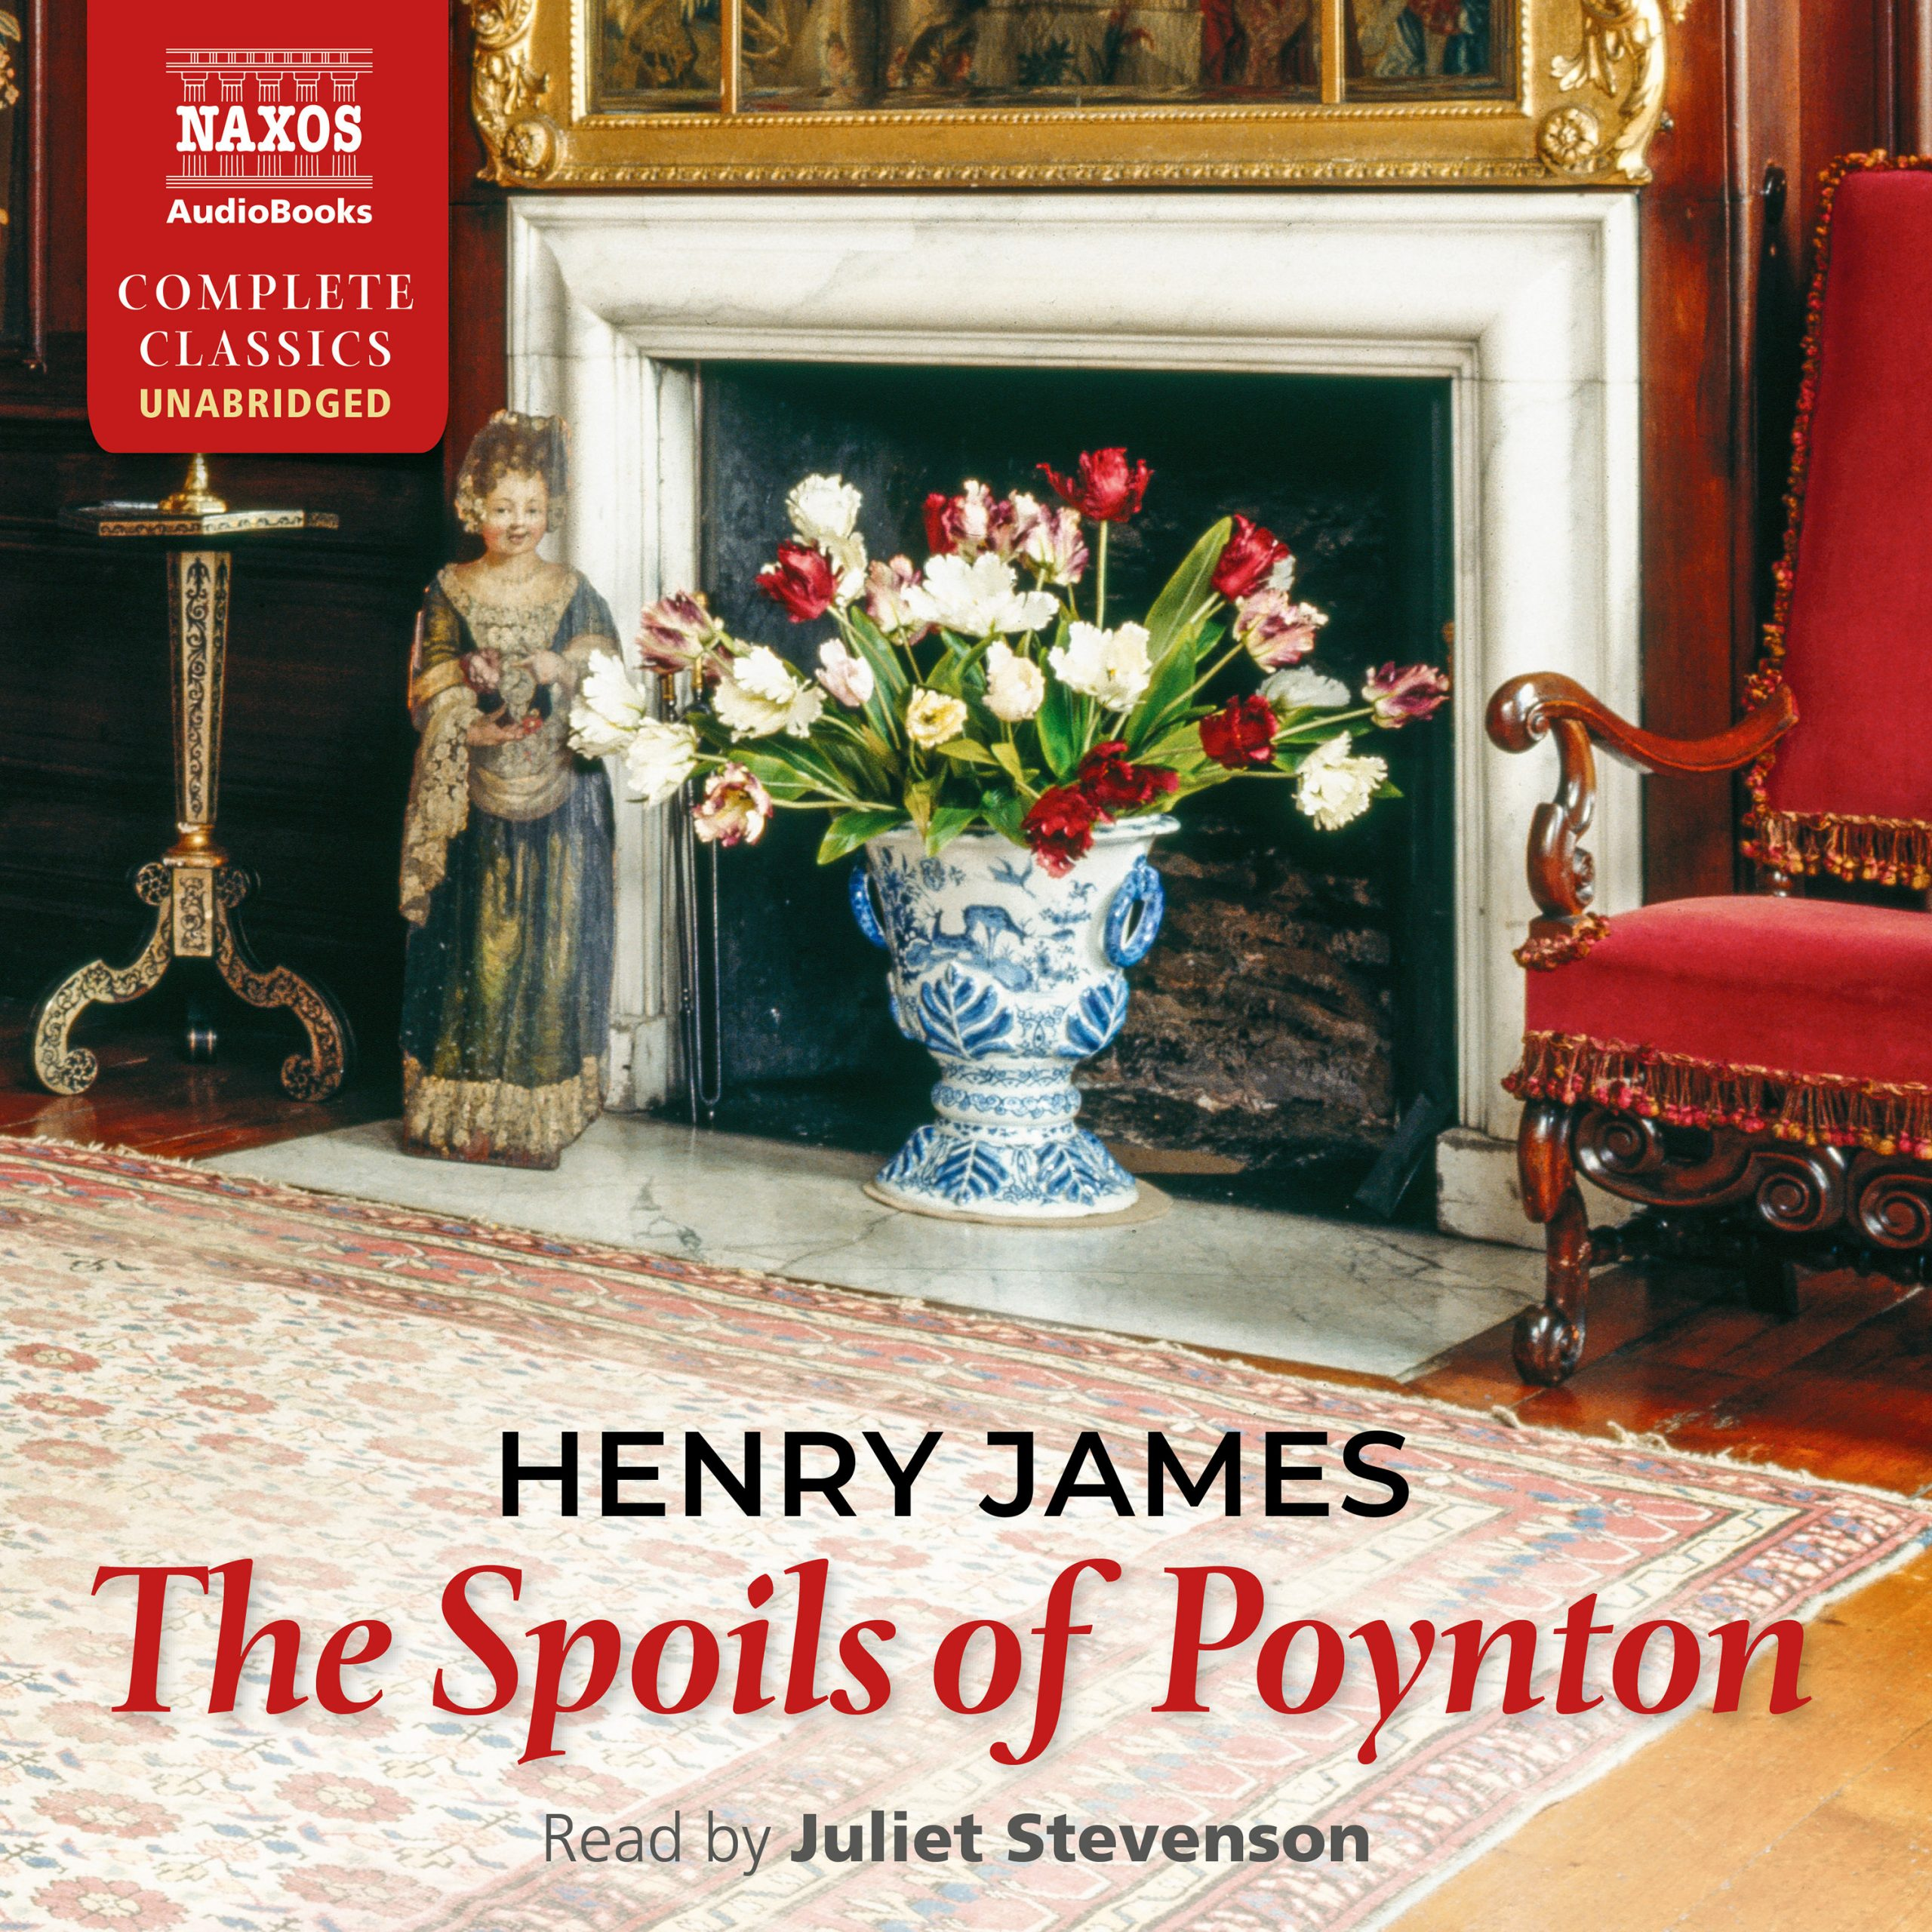 The Spoils of Poynton (unabridged)